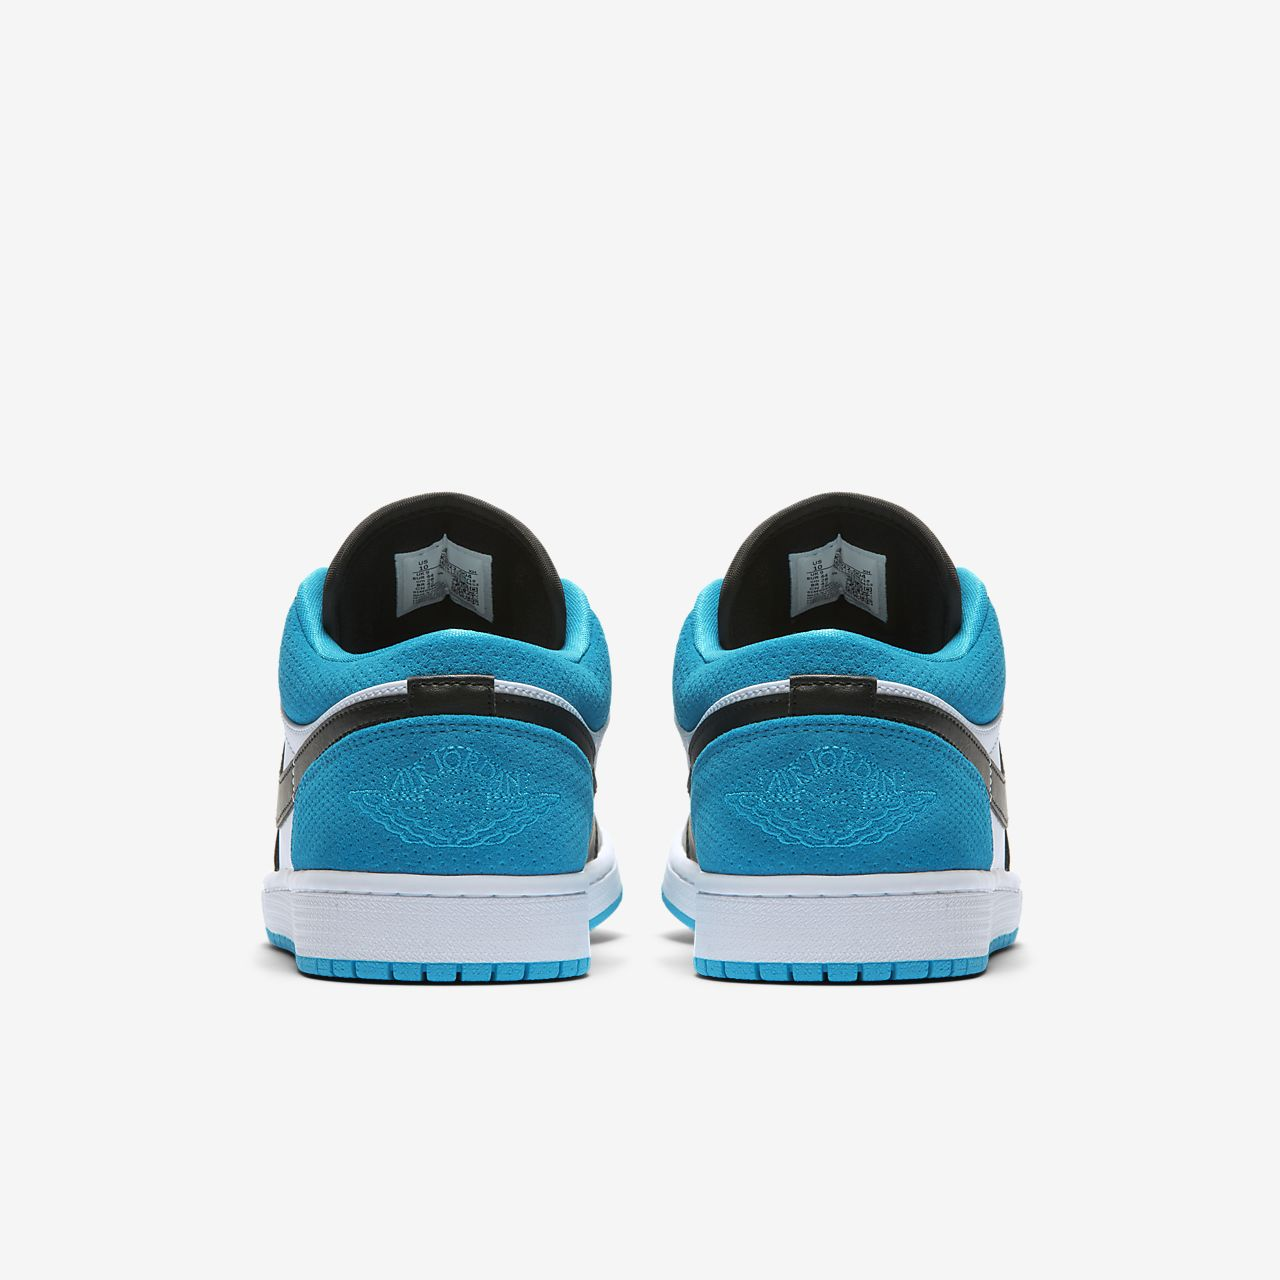 air jordan 1 low homme bleu